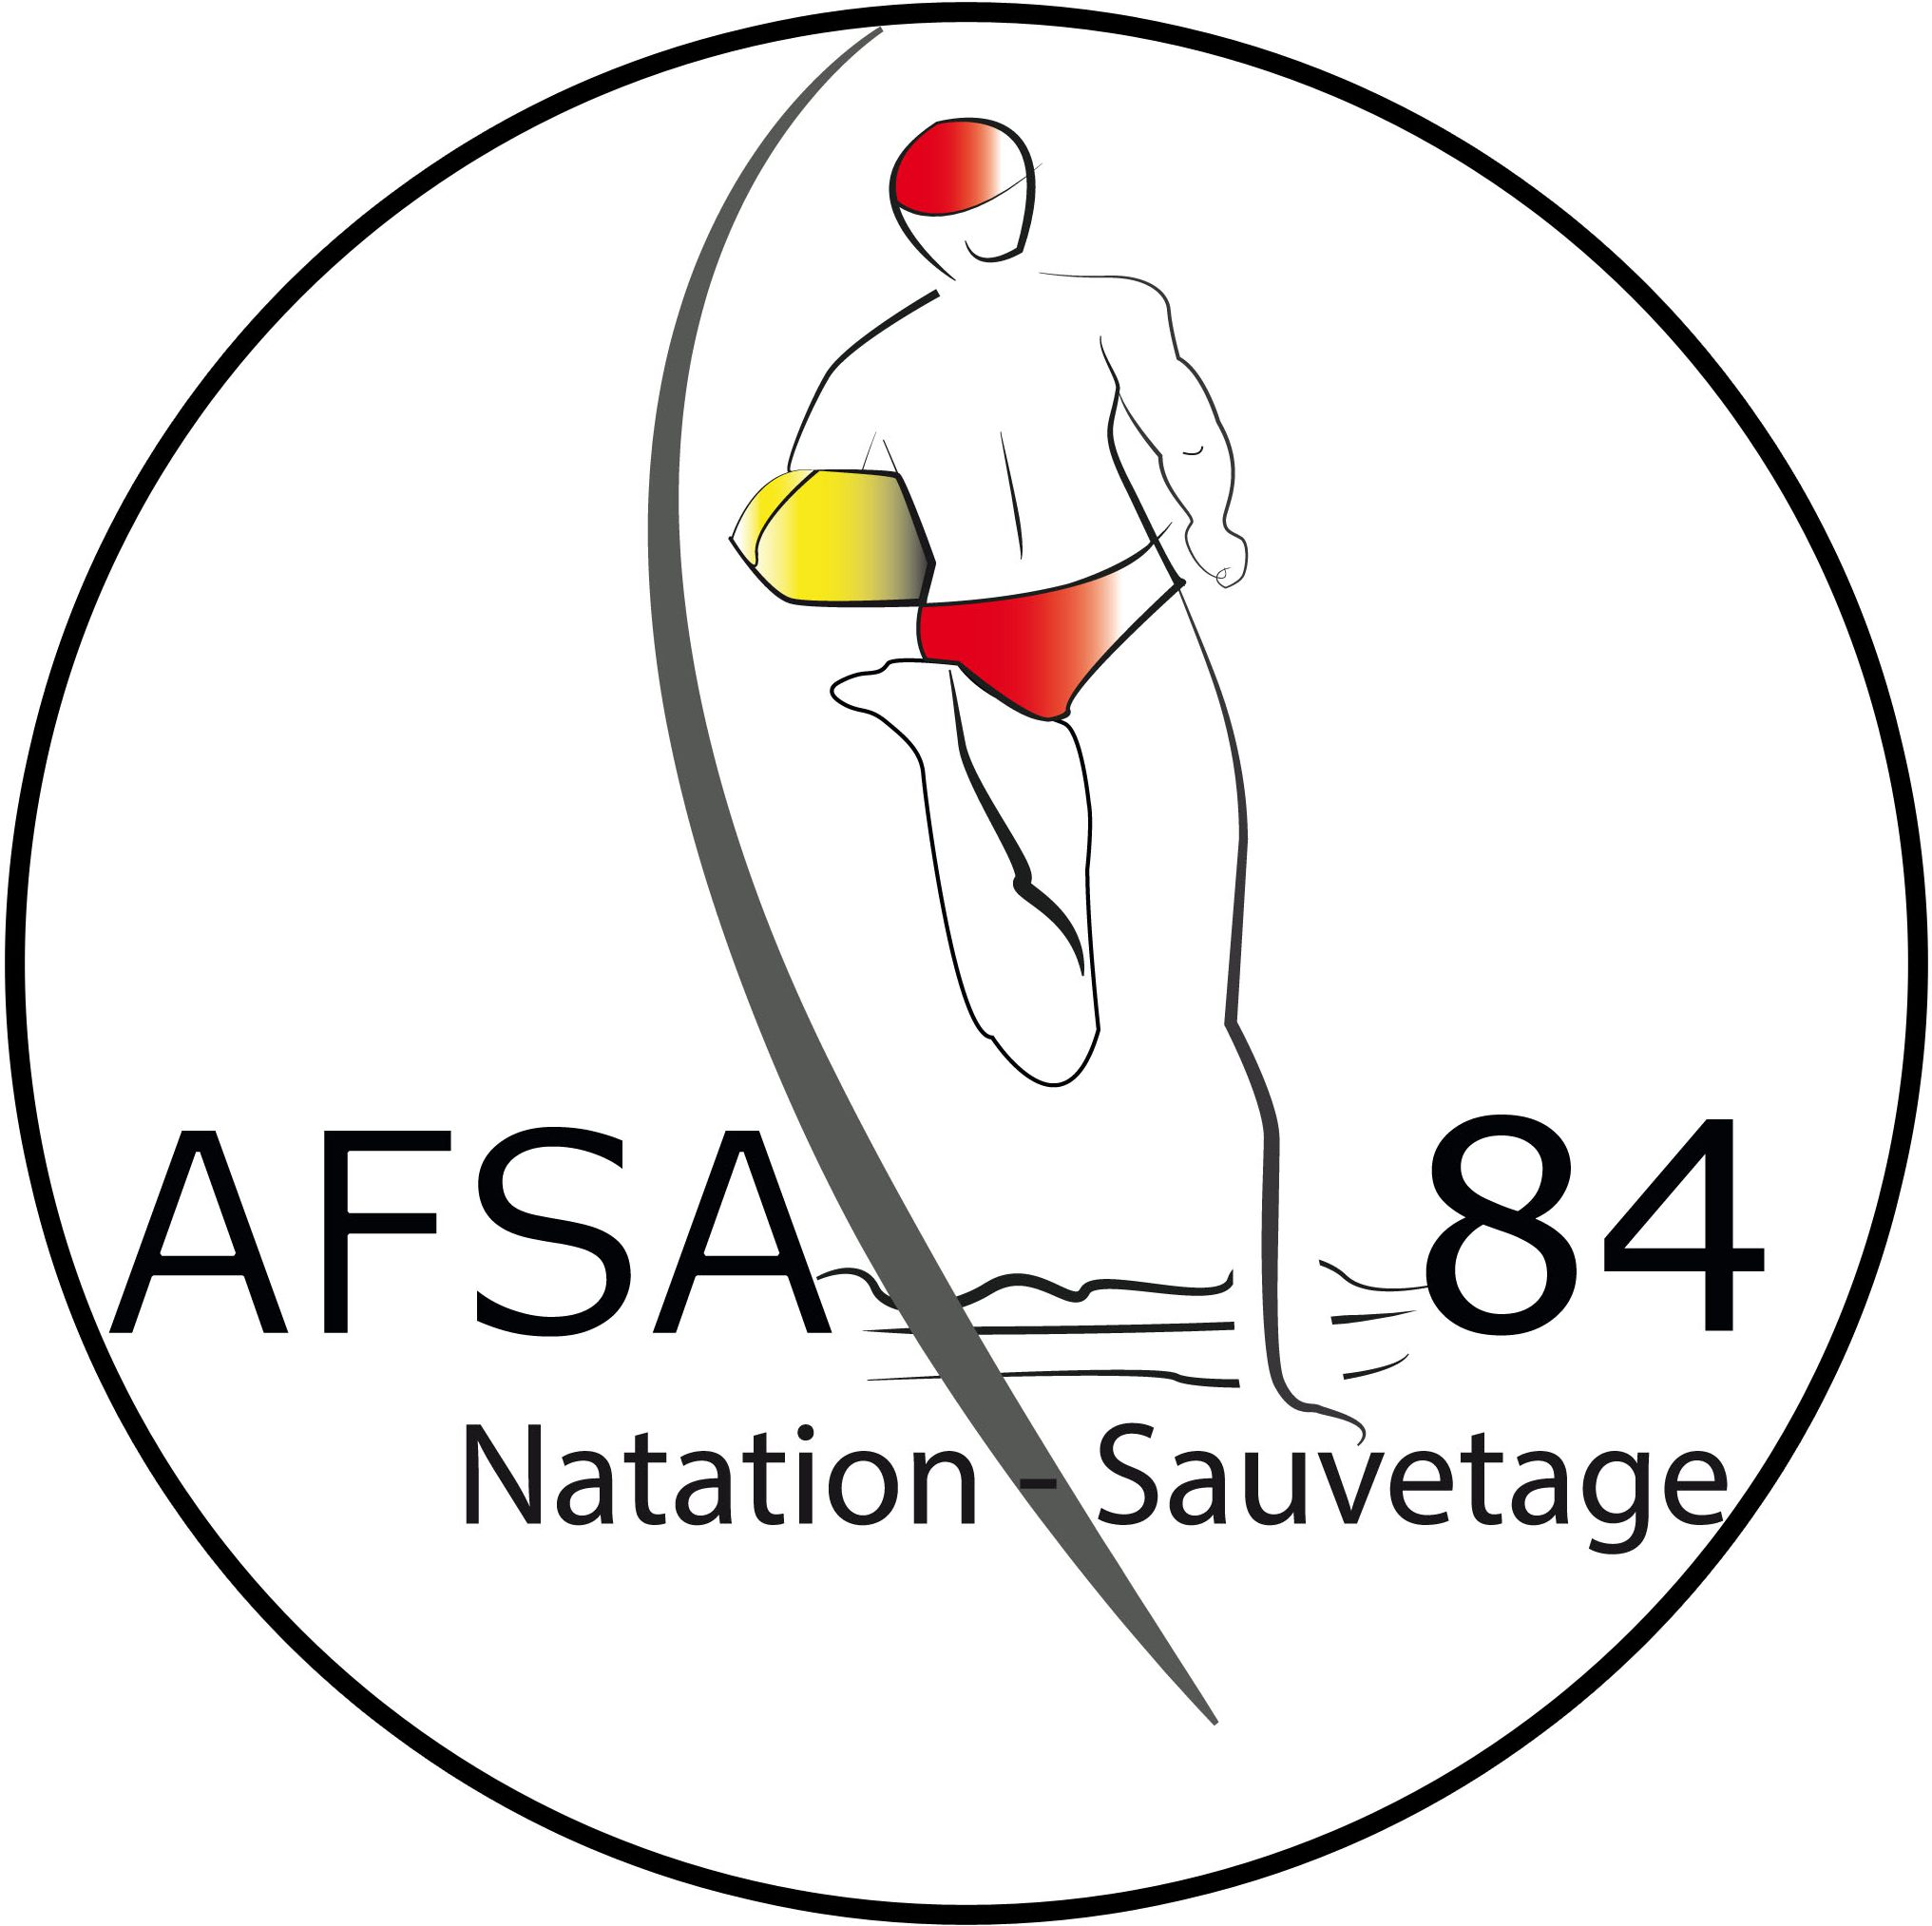 AFSA 84